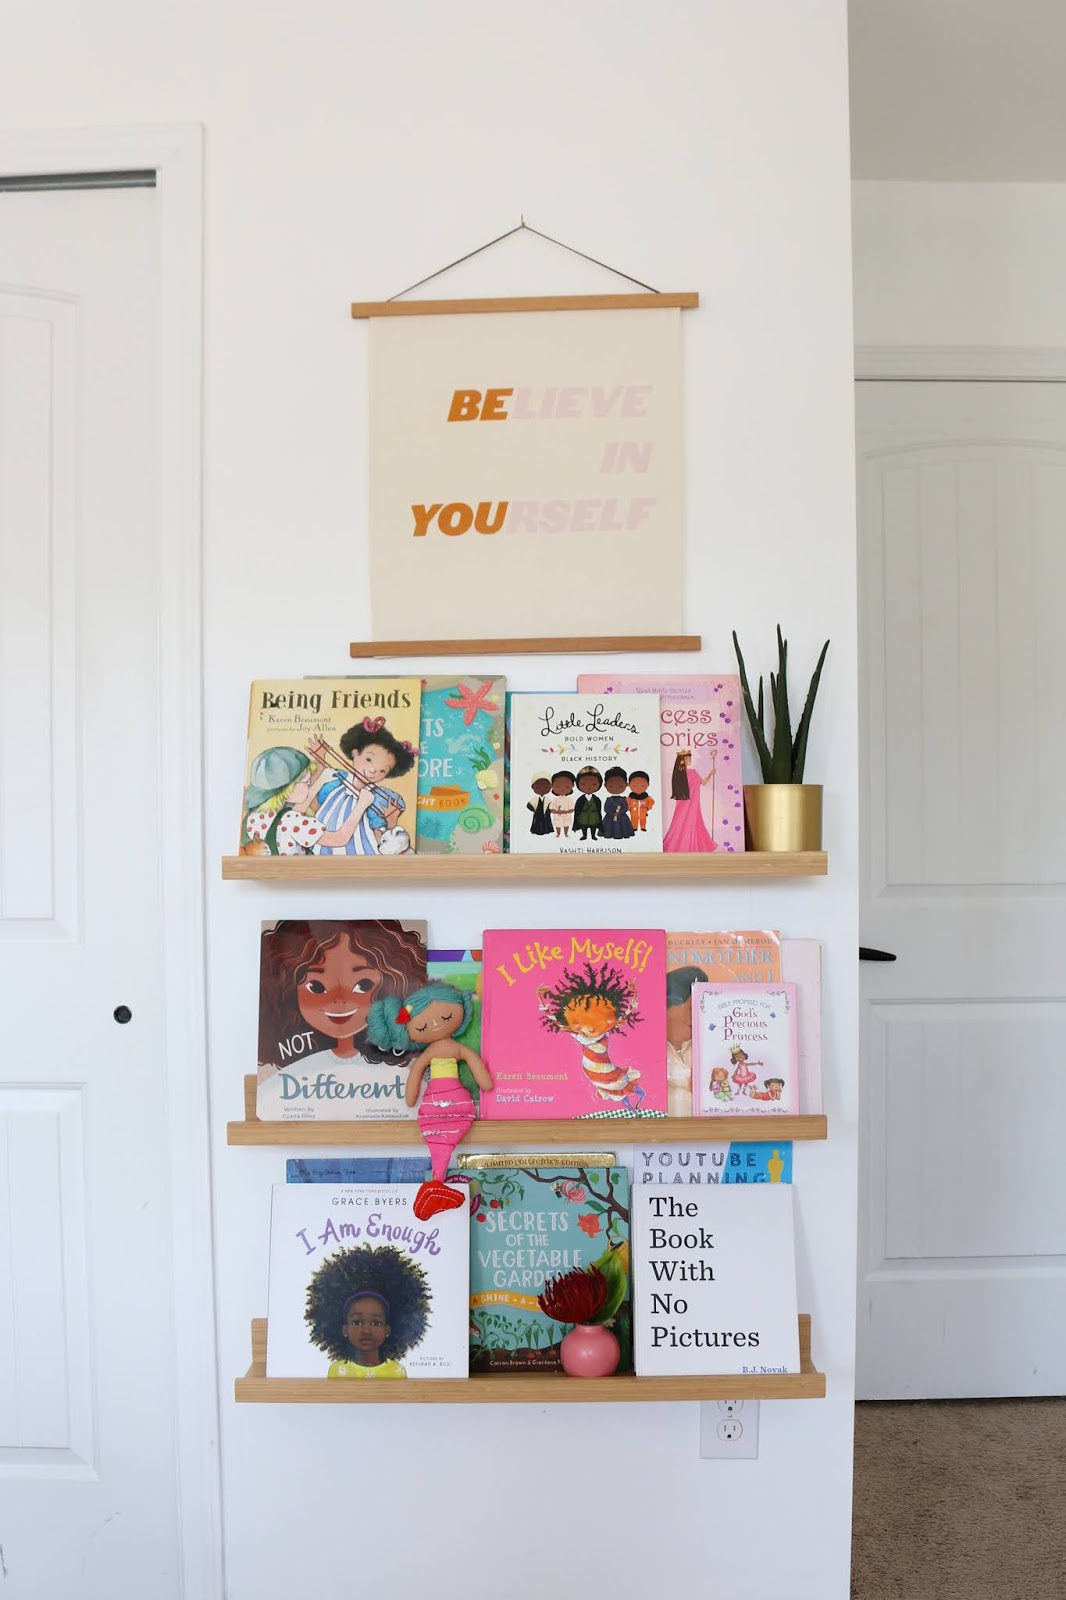 Book Ledges with POC books